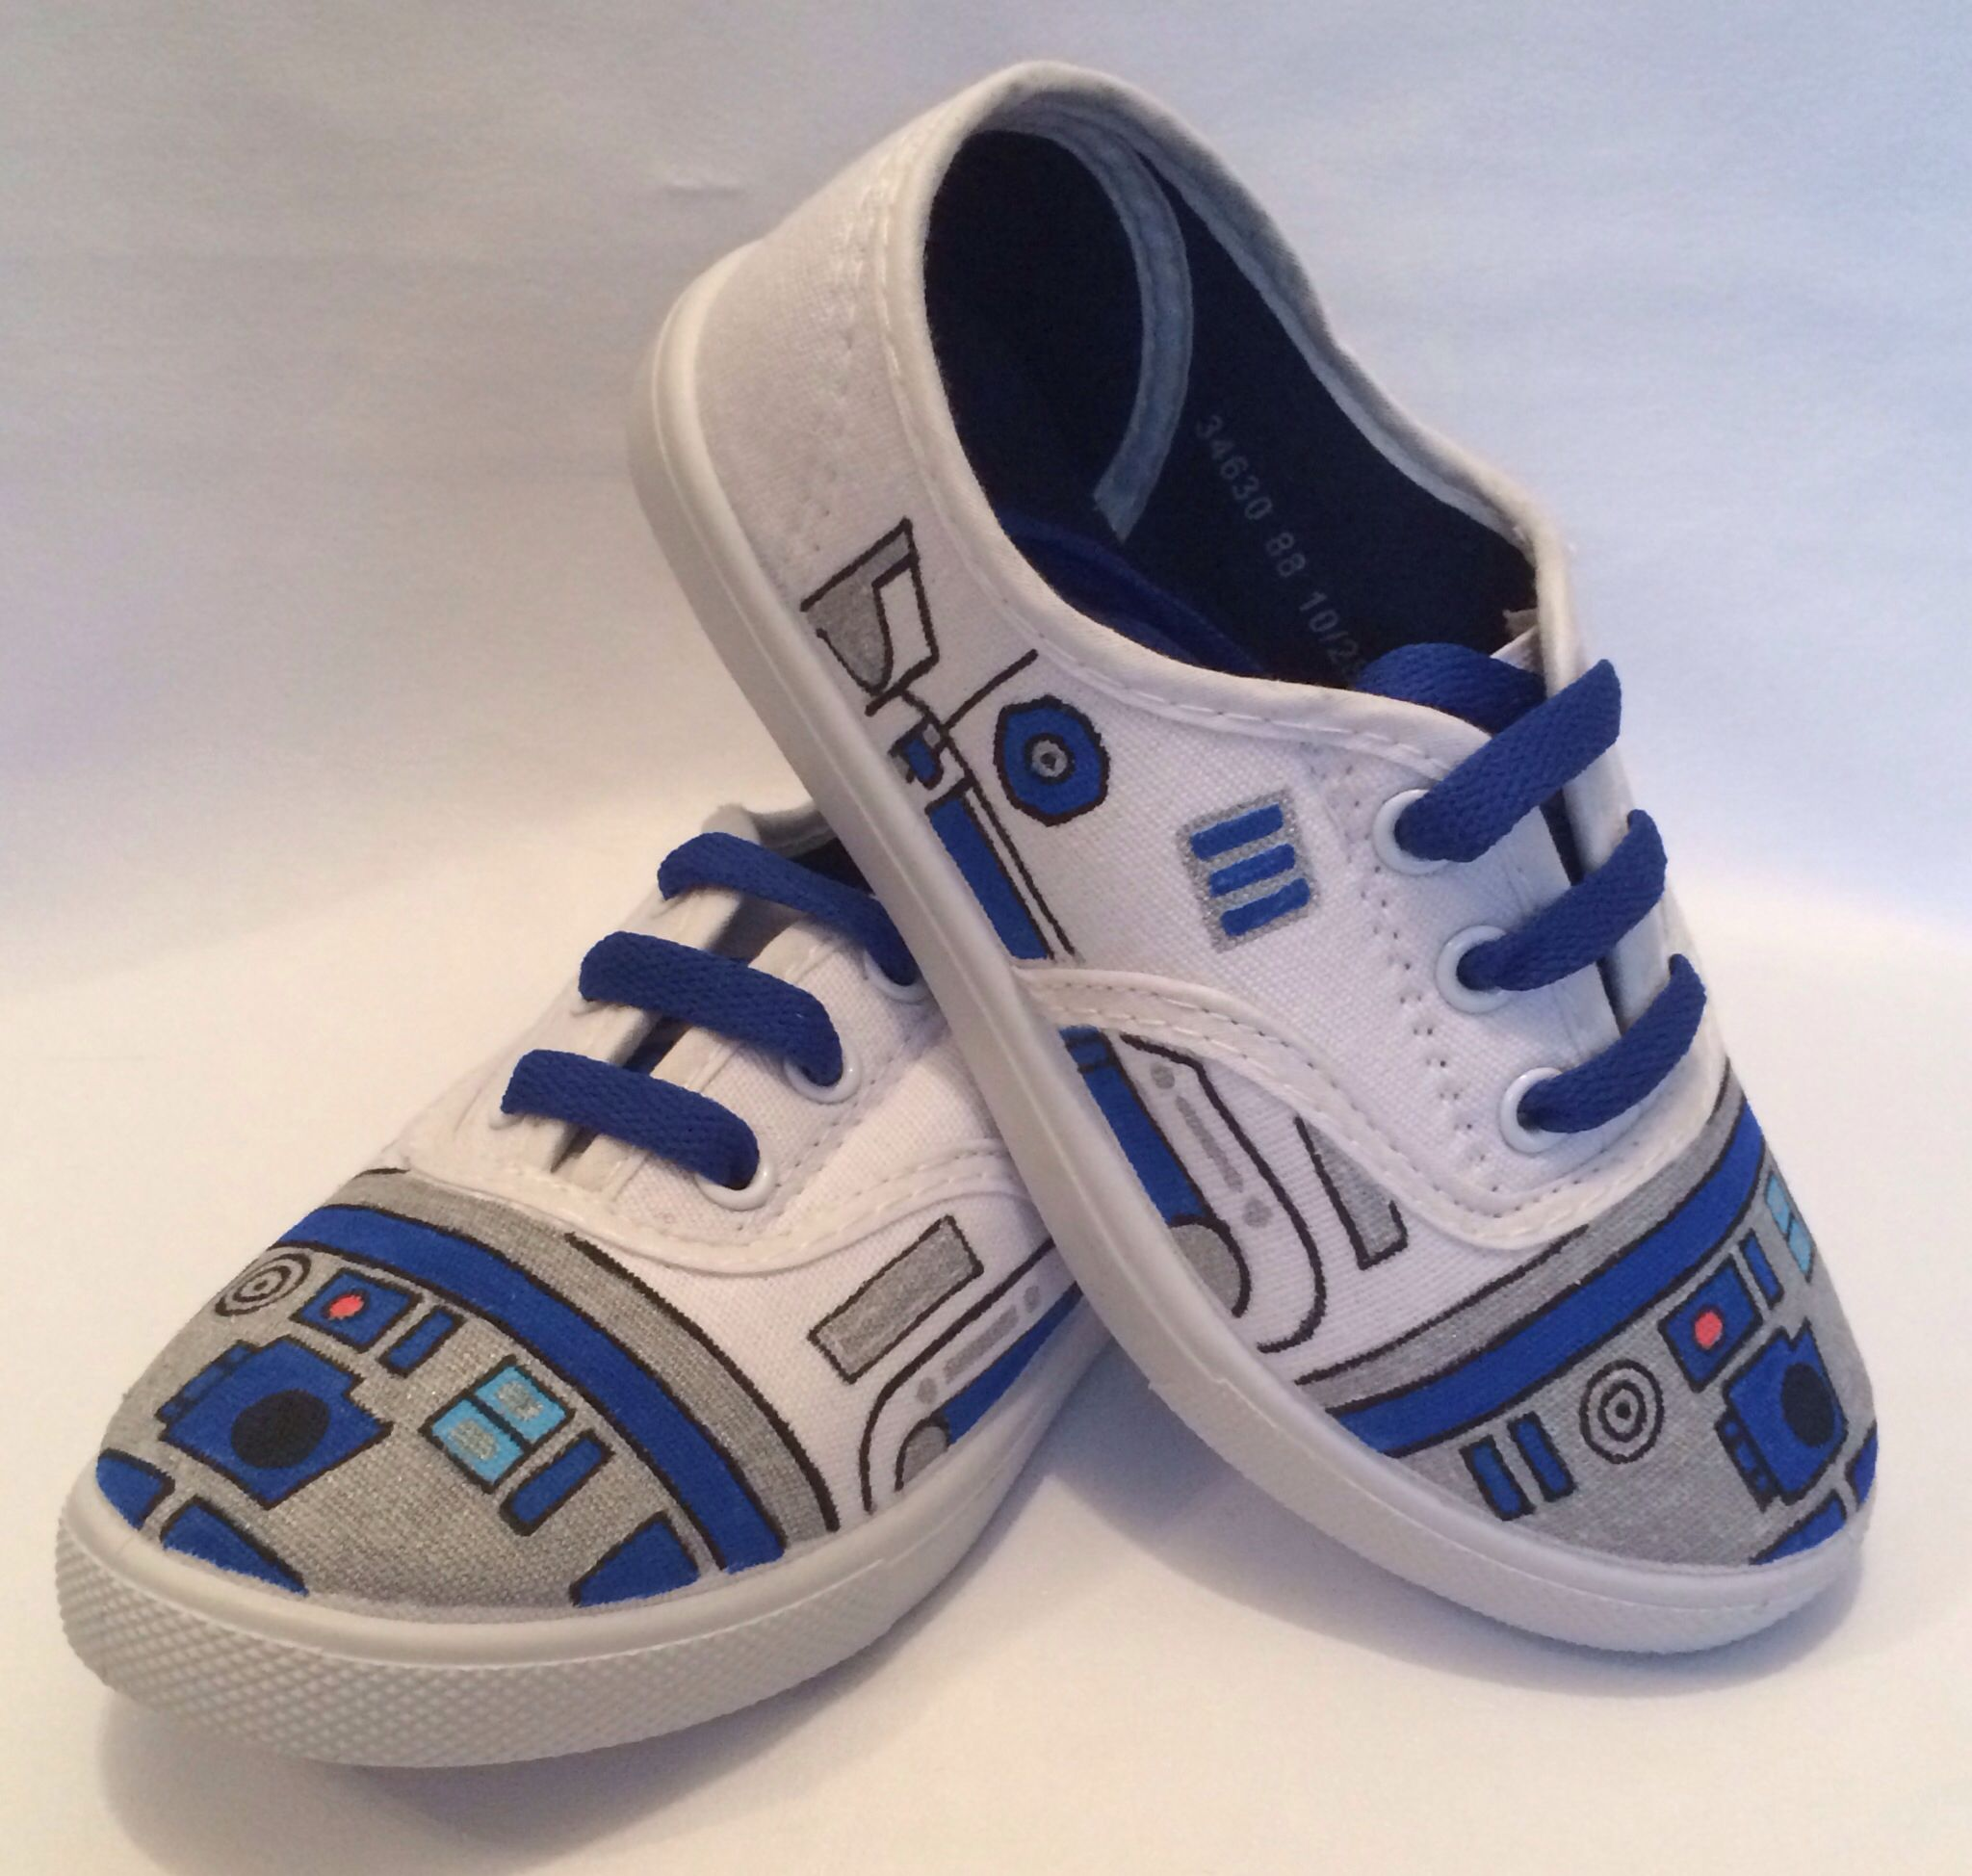 03caa8530183c Star Wars R2D2 shoes by the custom underground #starwars | (G)Eeeek ...